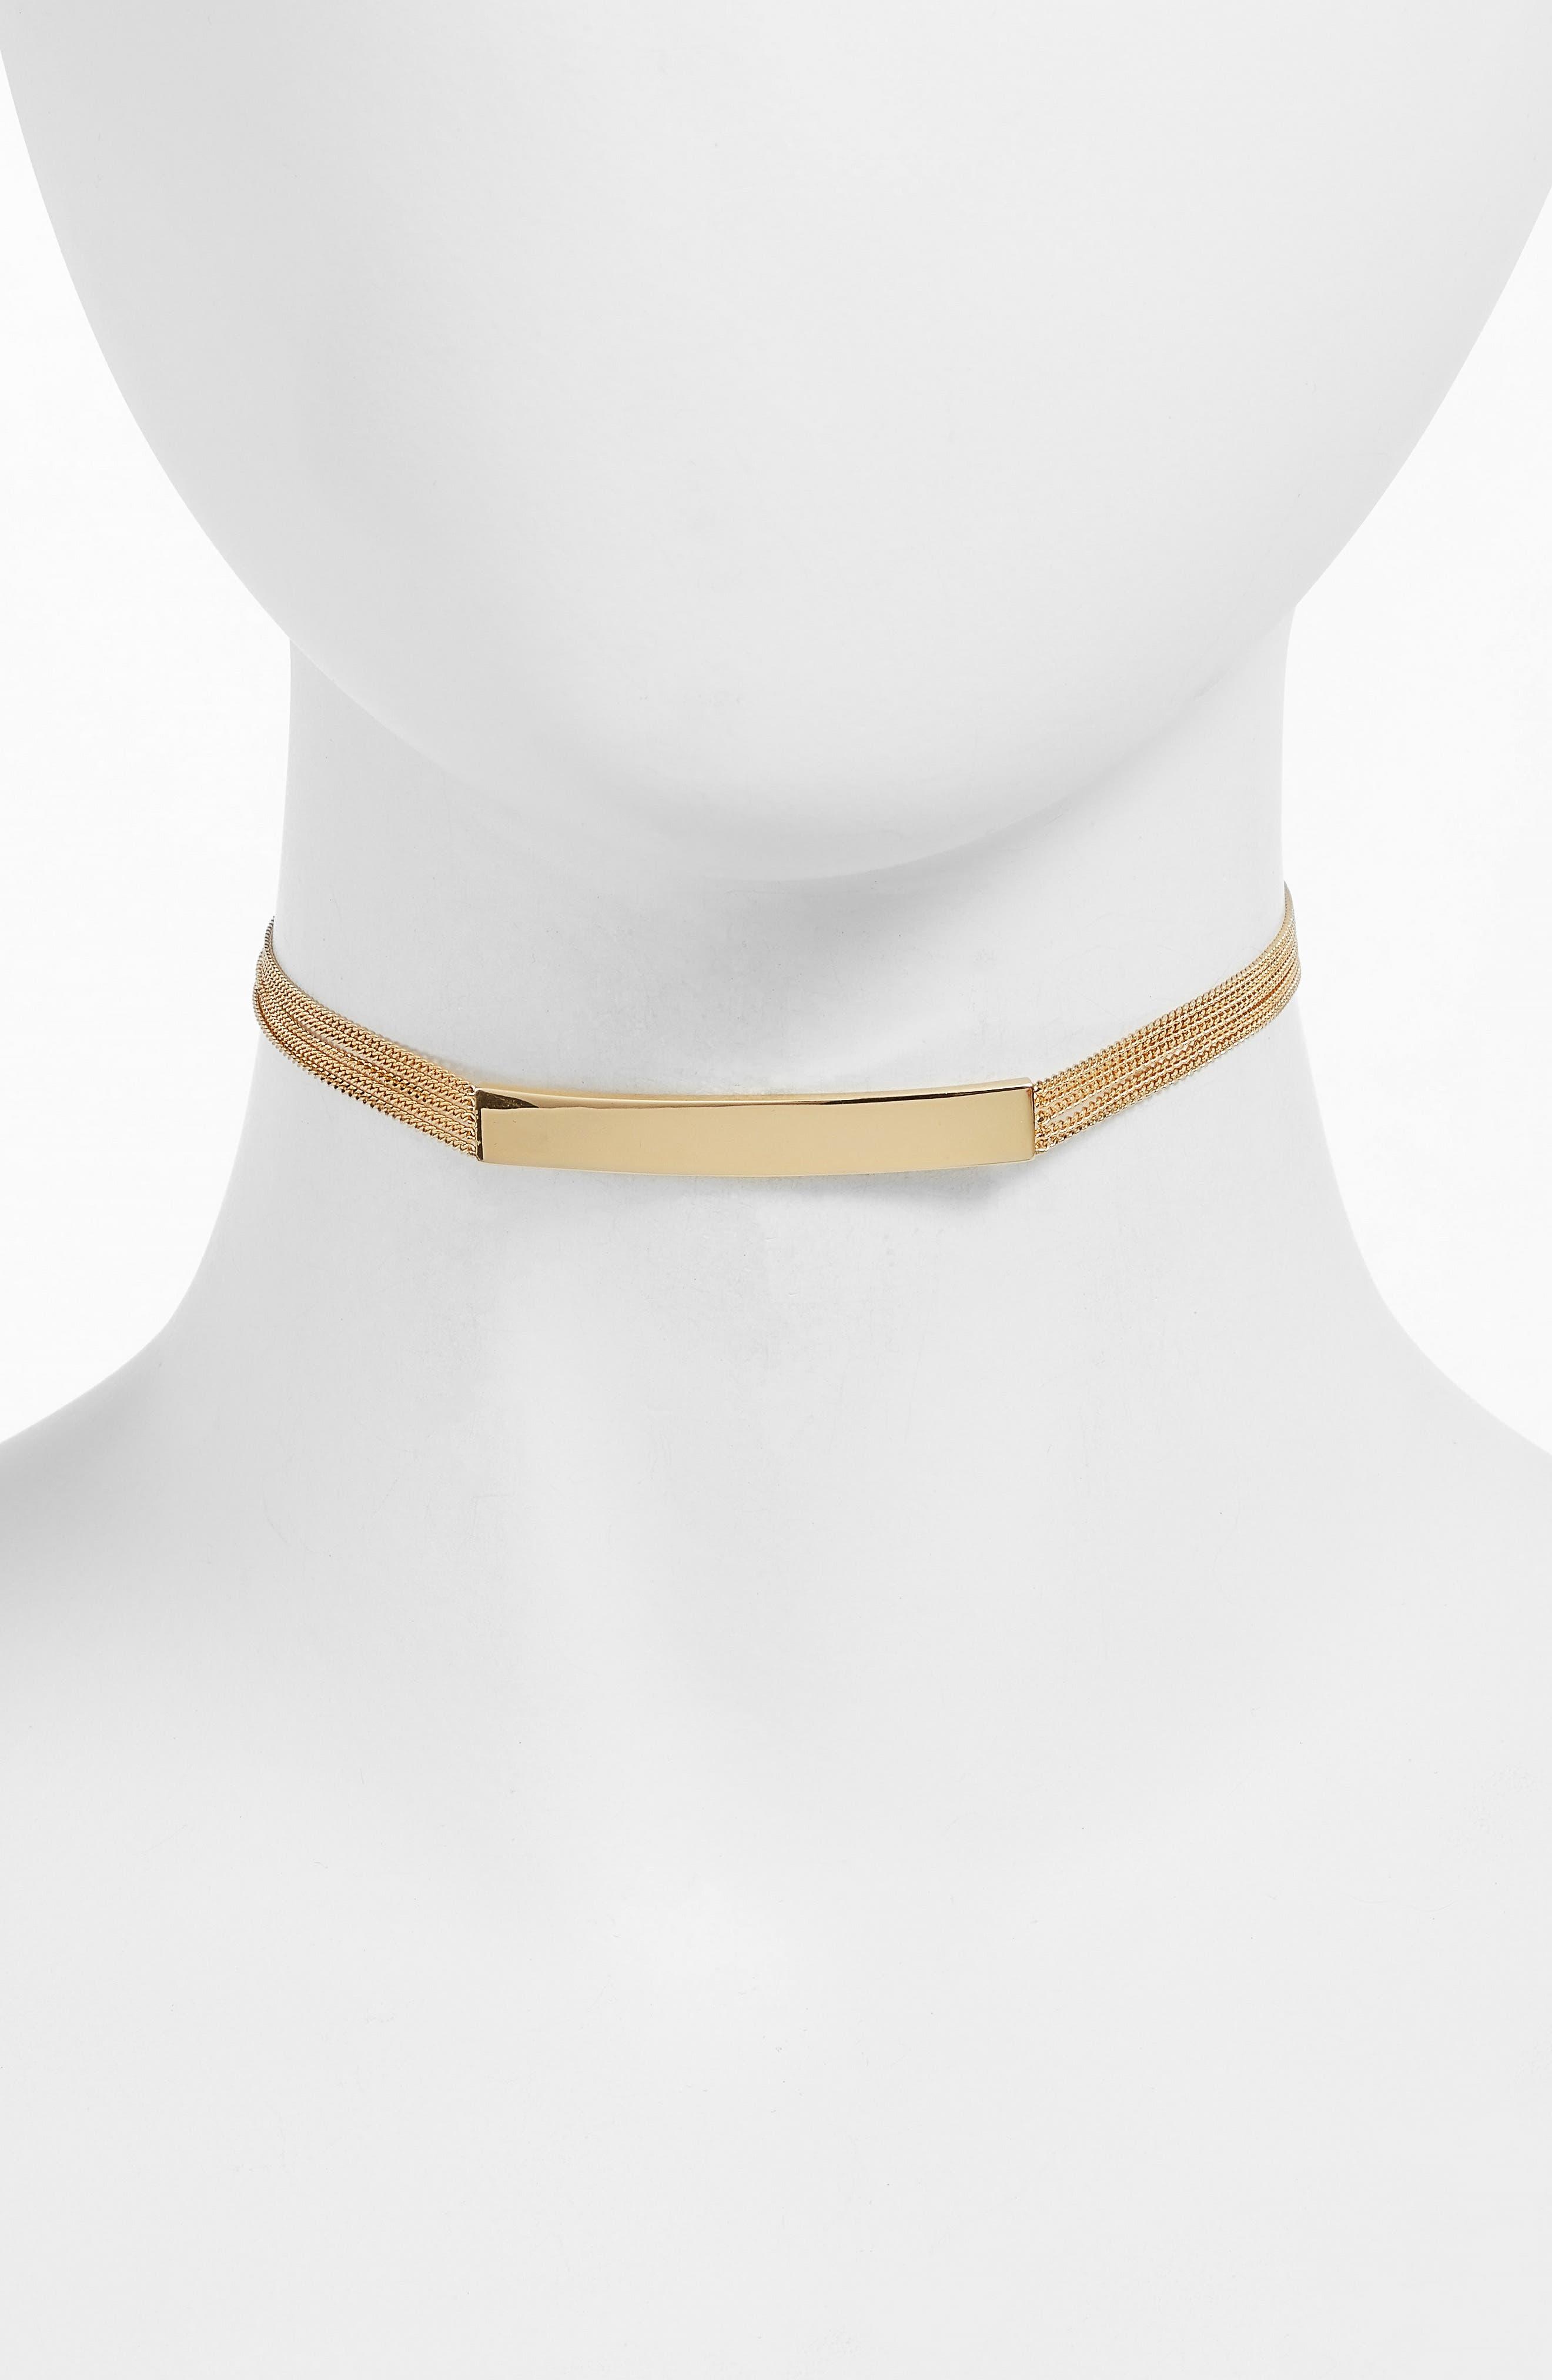 Thera ID Choker,                         Main,                         color, Gold